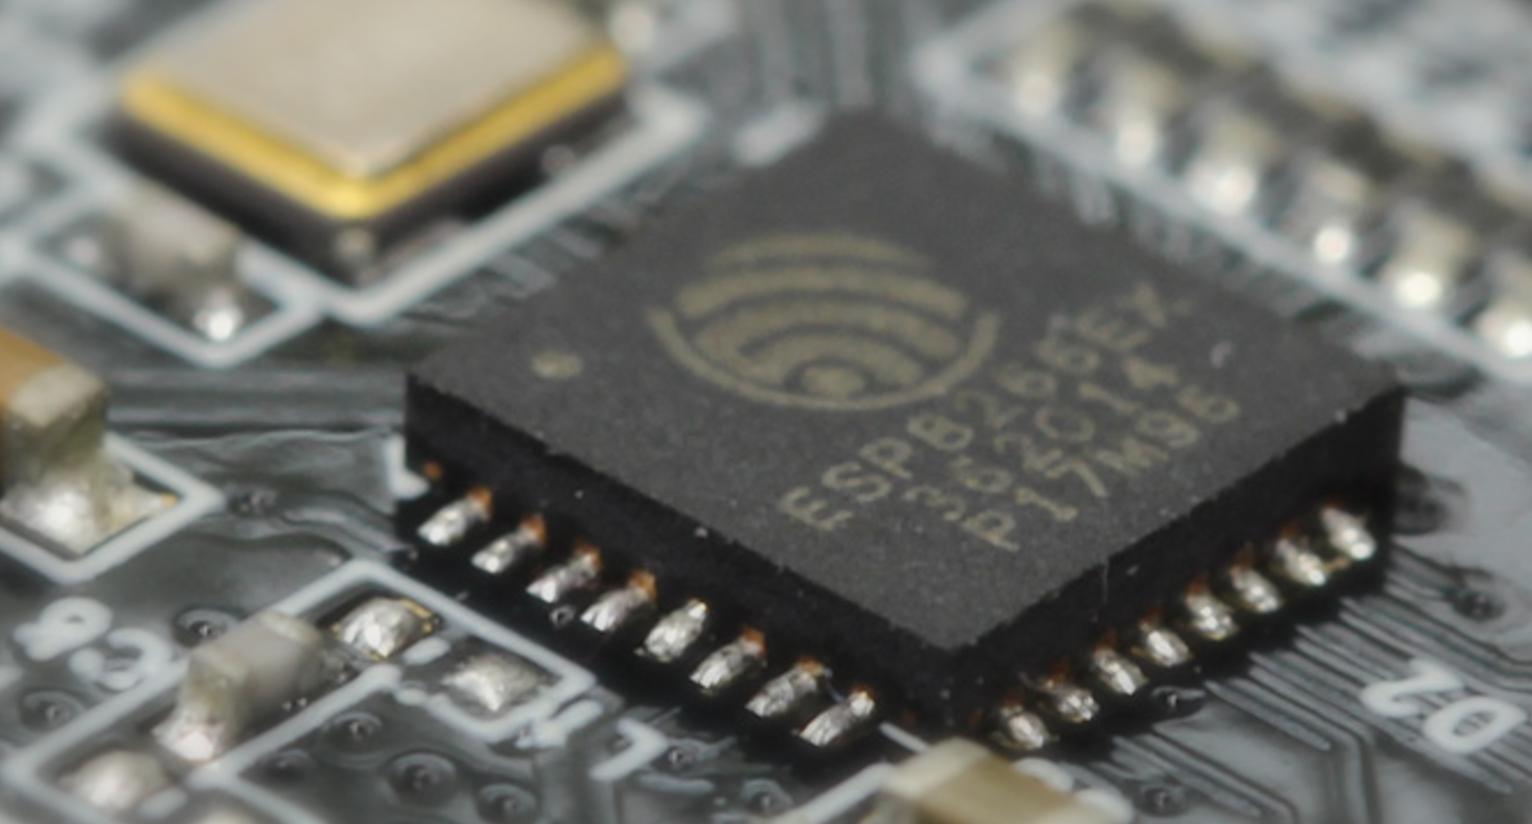 Aaron Ardiri - IoT Blog: Arduino introduces boards with Integrated WiFi